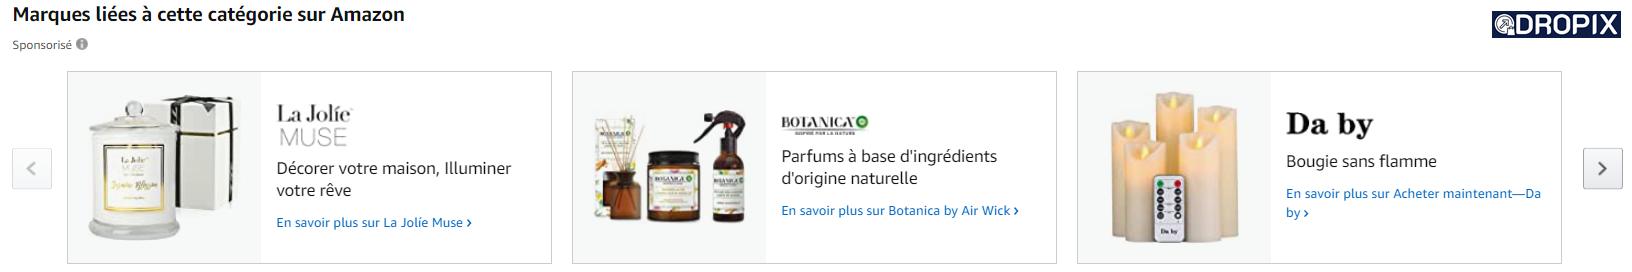 produits similaires suggestions produits marque dropshipping dropix